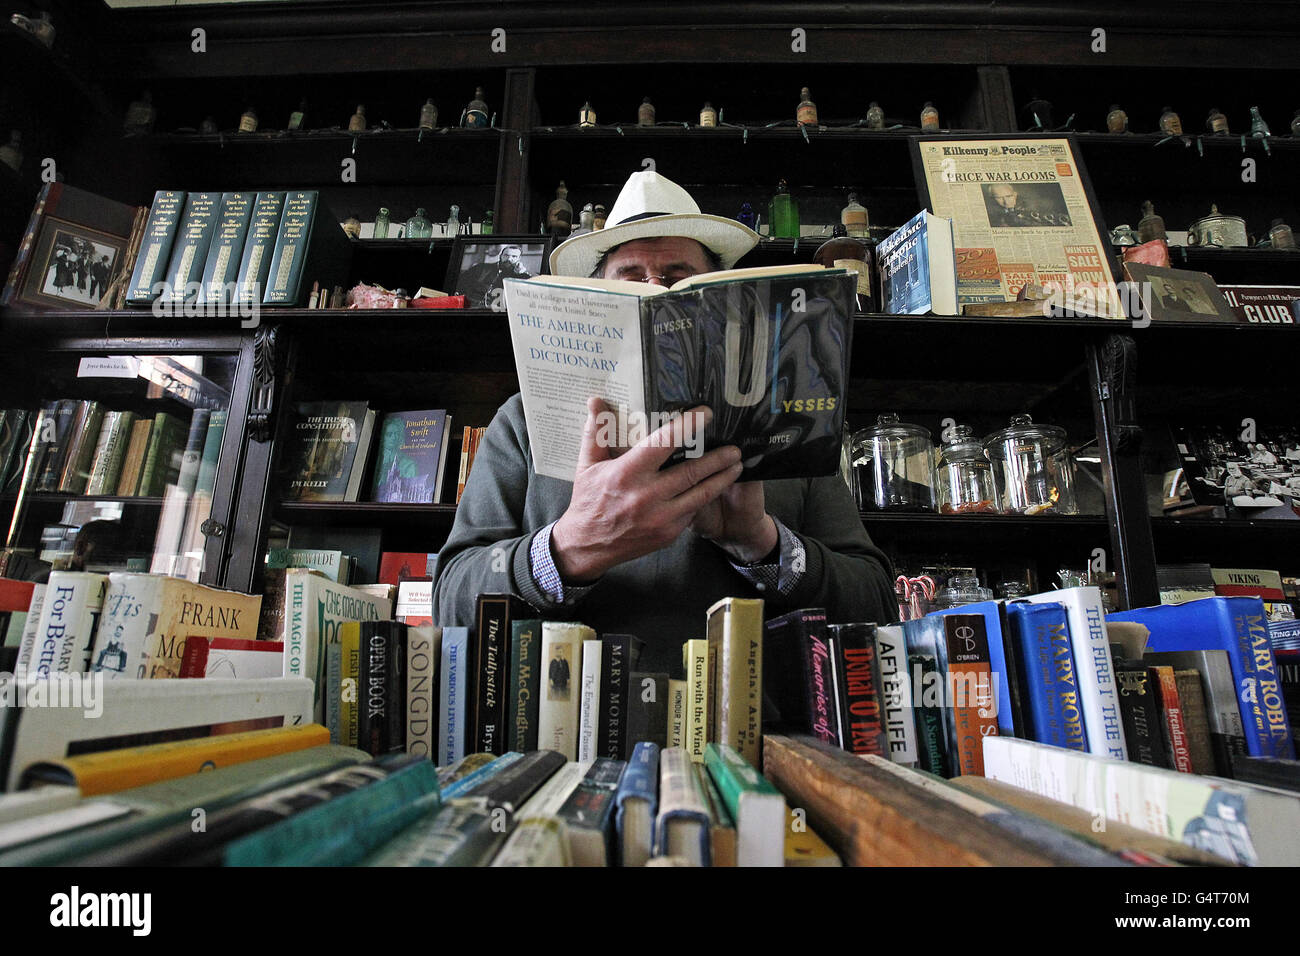 Célébration de James Joyce Photo Stock